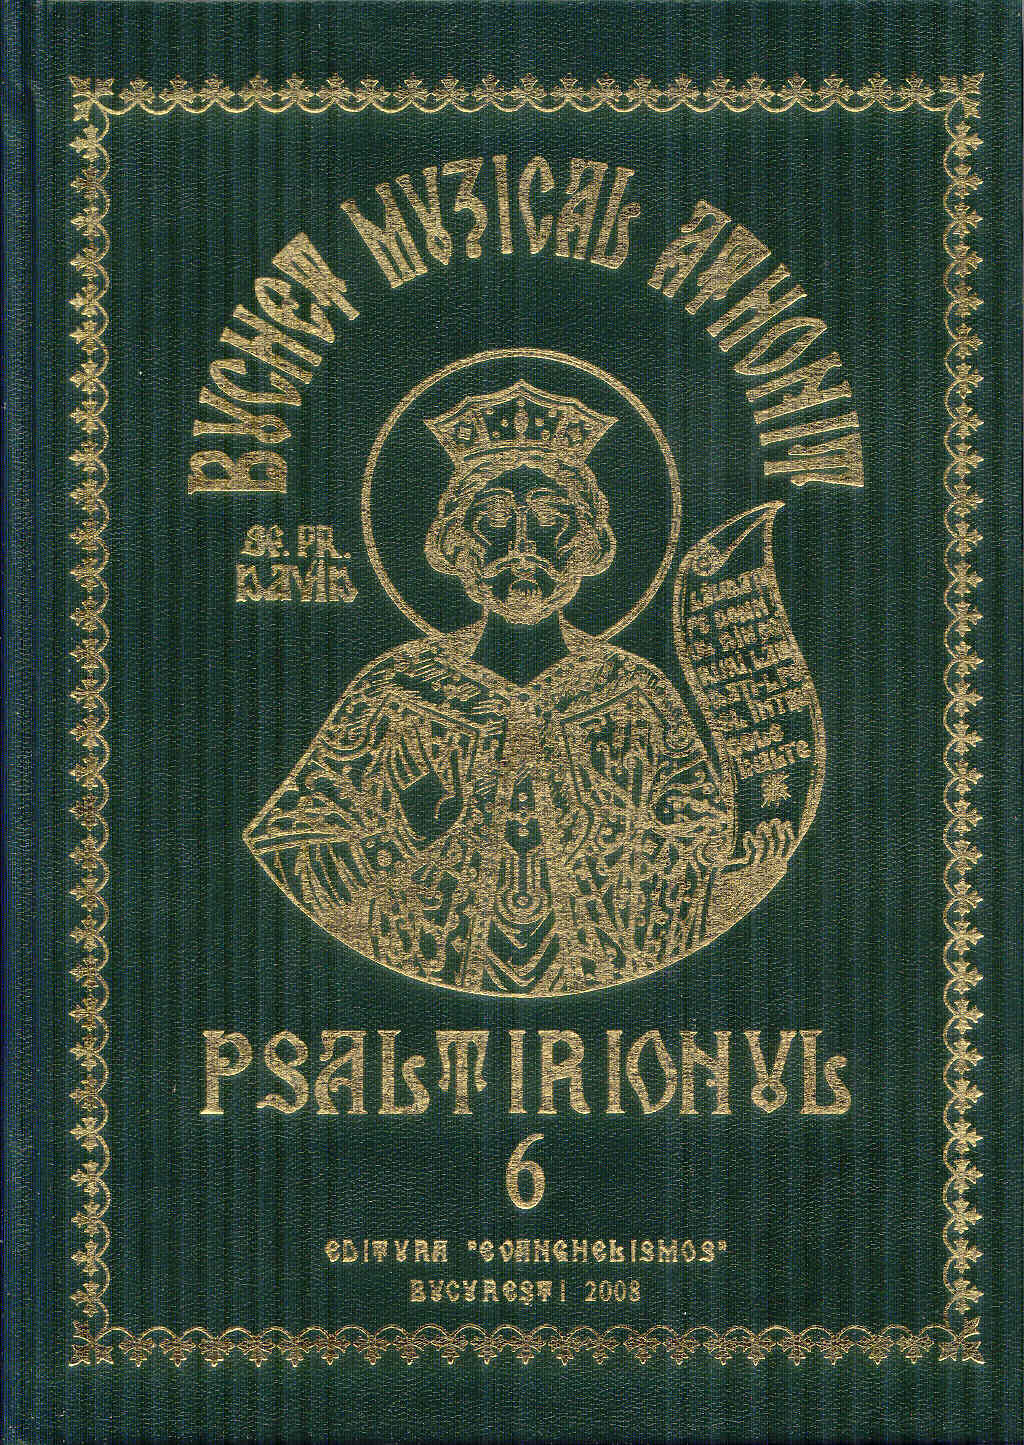 Buchet muzical athonit - Vol. 6 - Psaltirionul